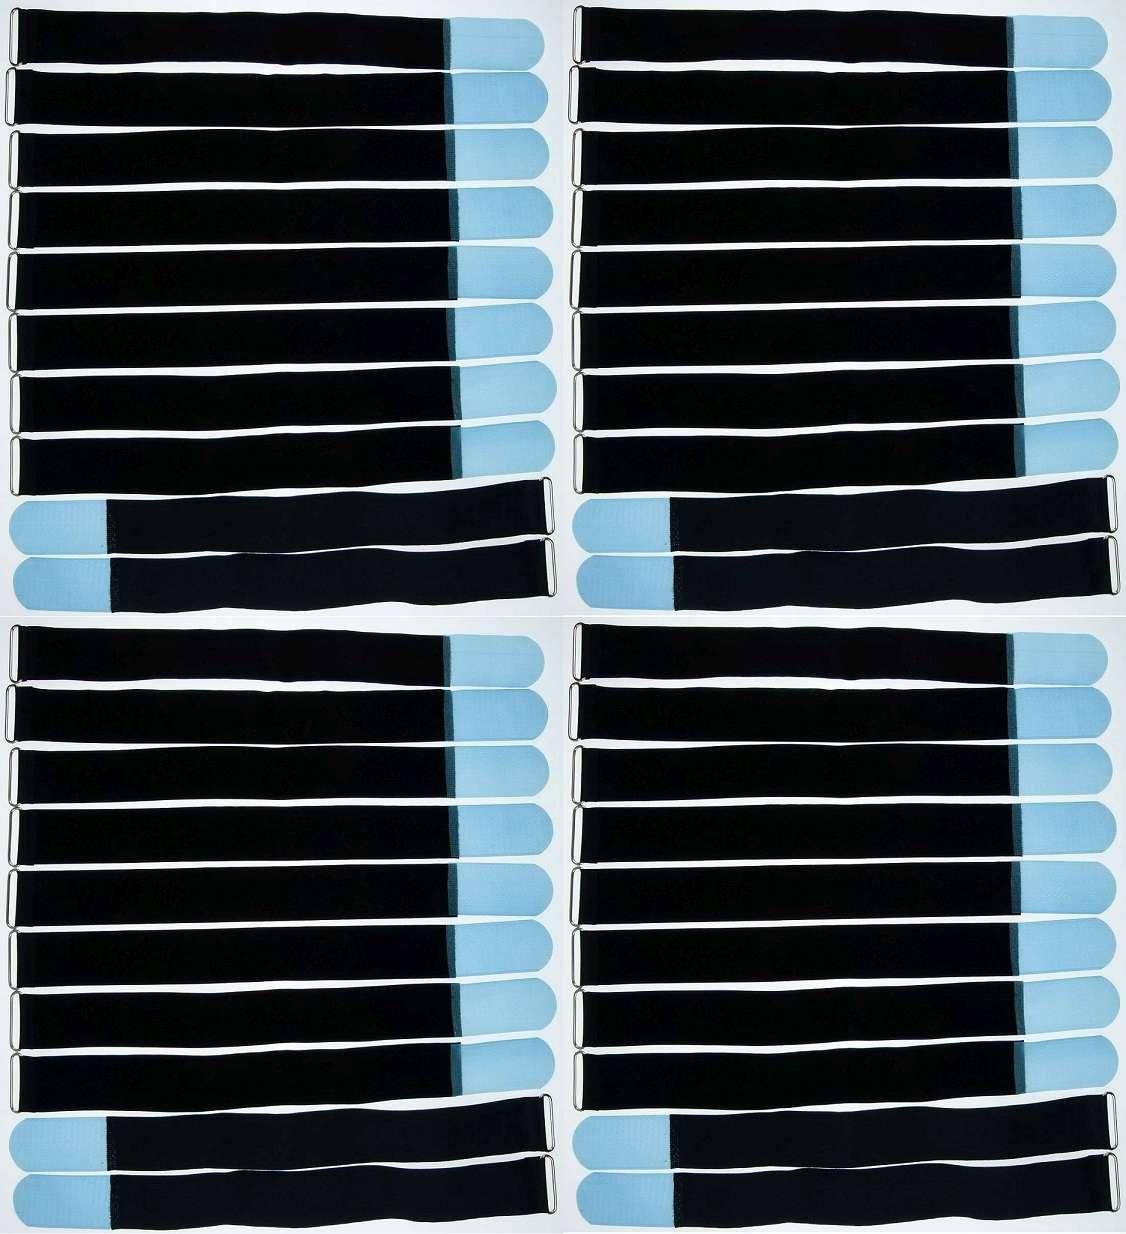 10x Kabelklett Klettband 300 x 20 mm hell blau Öse Klett Kabelbinder Klettbänder